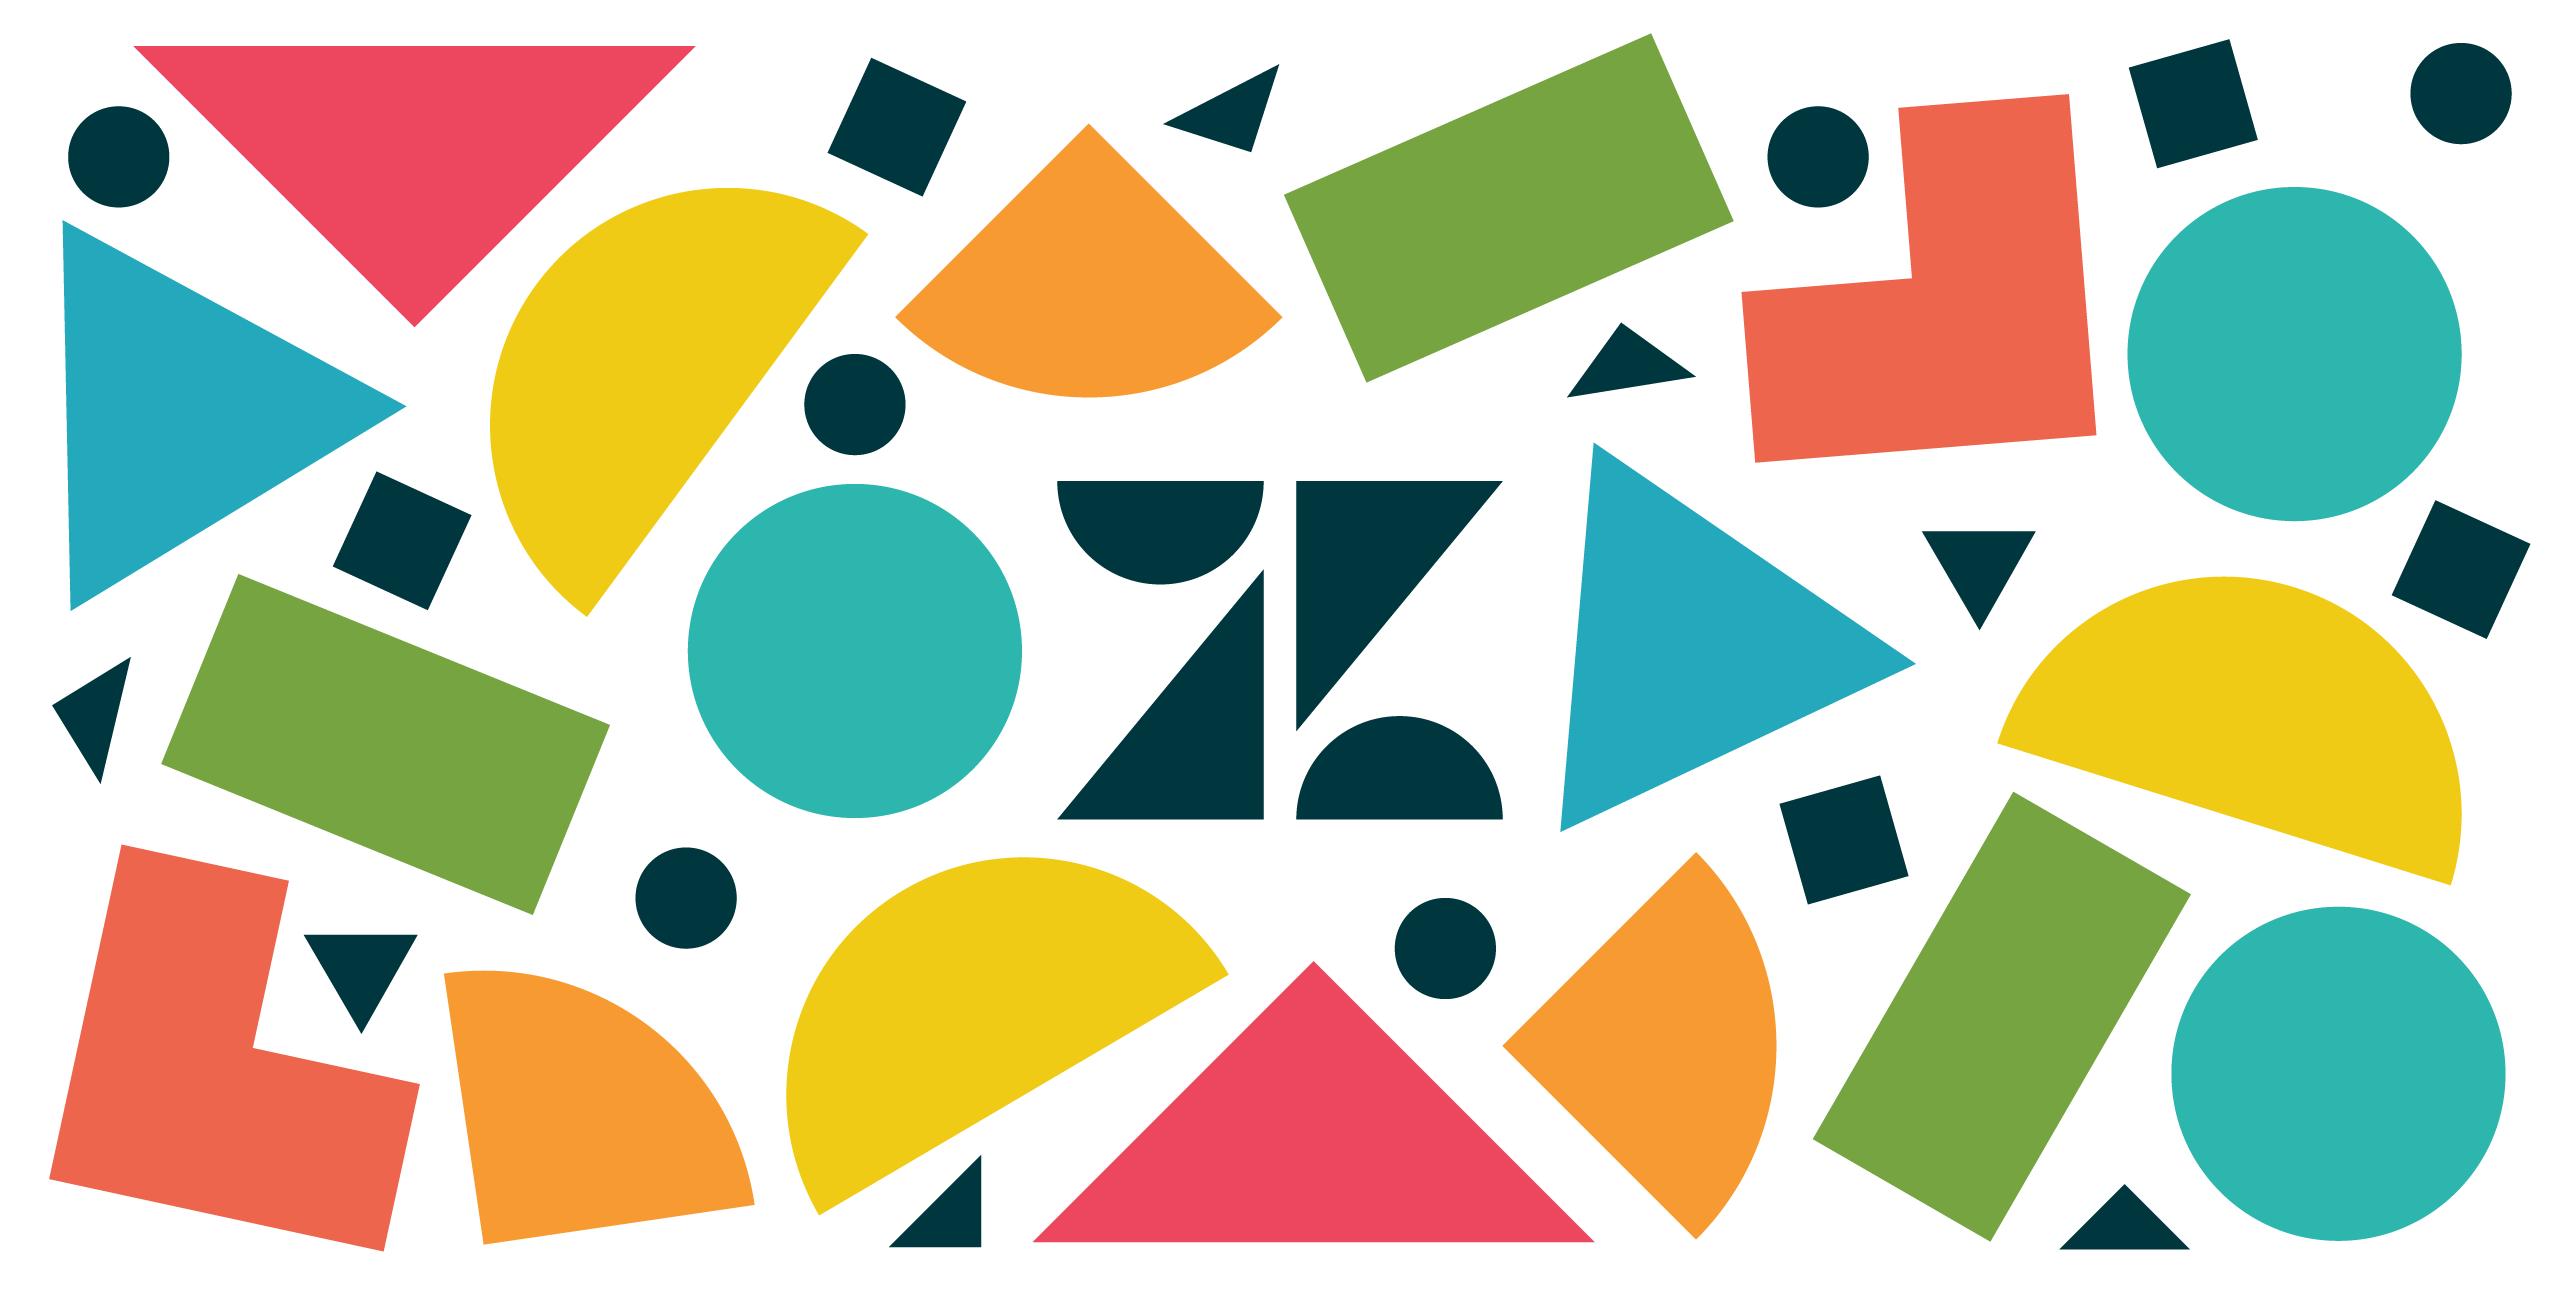 http://hypernovalabs.com/wp-content/uploads/2019/03/Ultimas_funcionalidades_zendesk.png